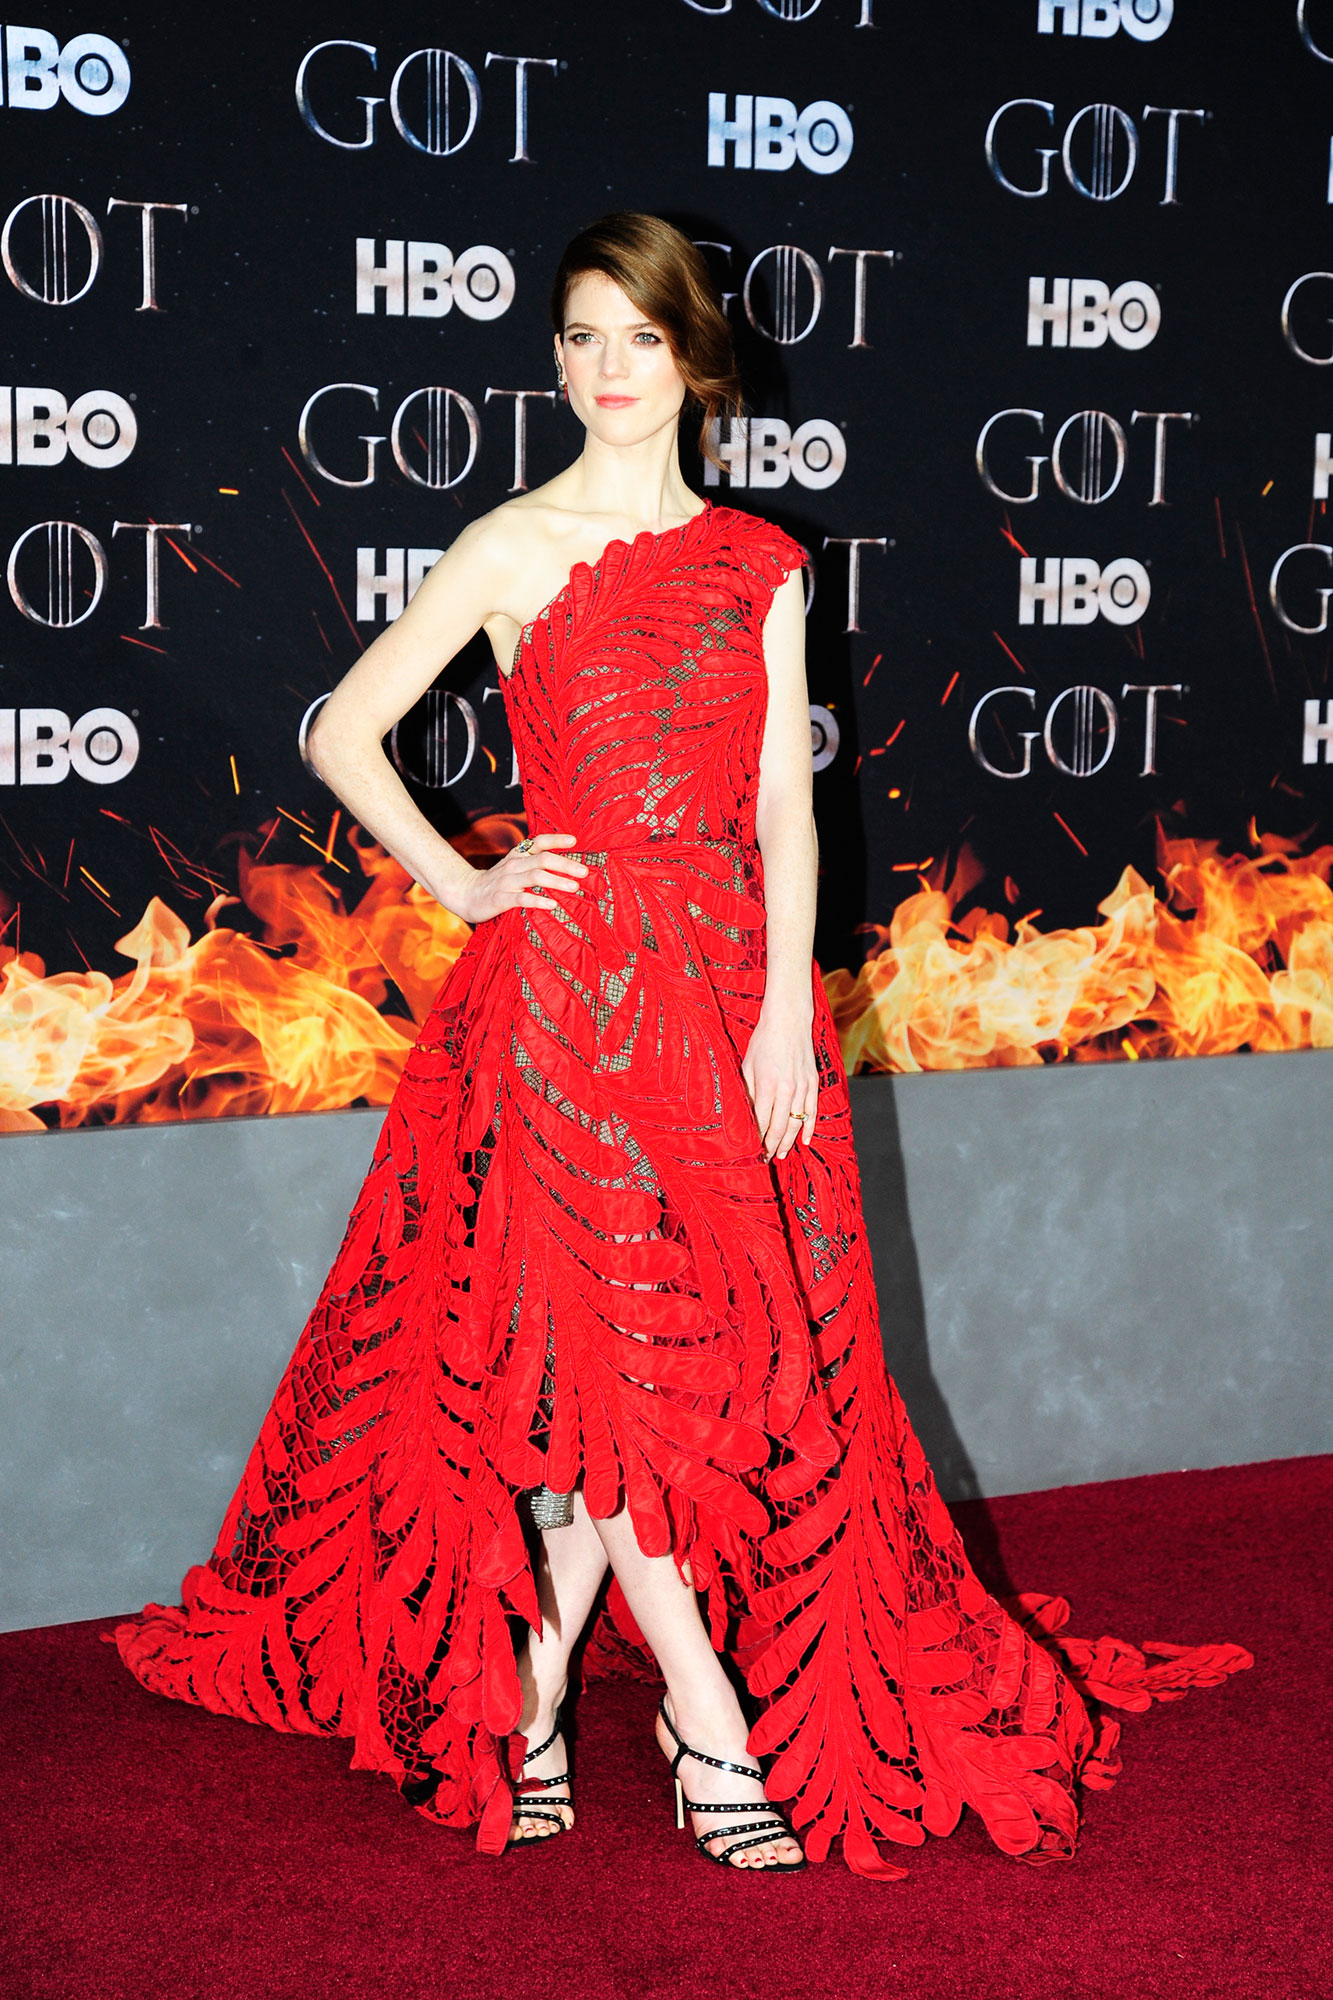 Rose Leslie game of thrones - Wearing an asymmetrical red Oscar de la Renta tea-length dress.